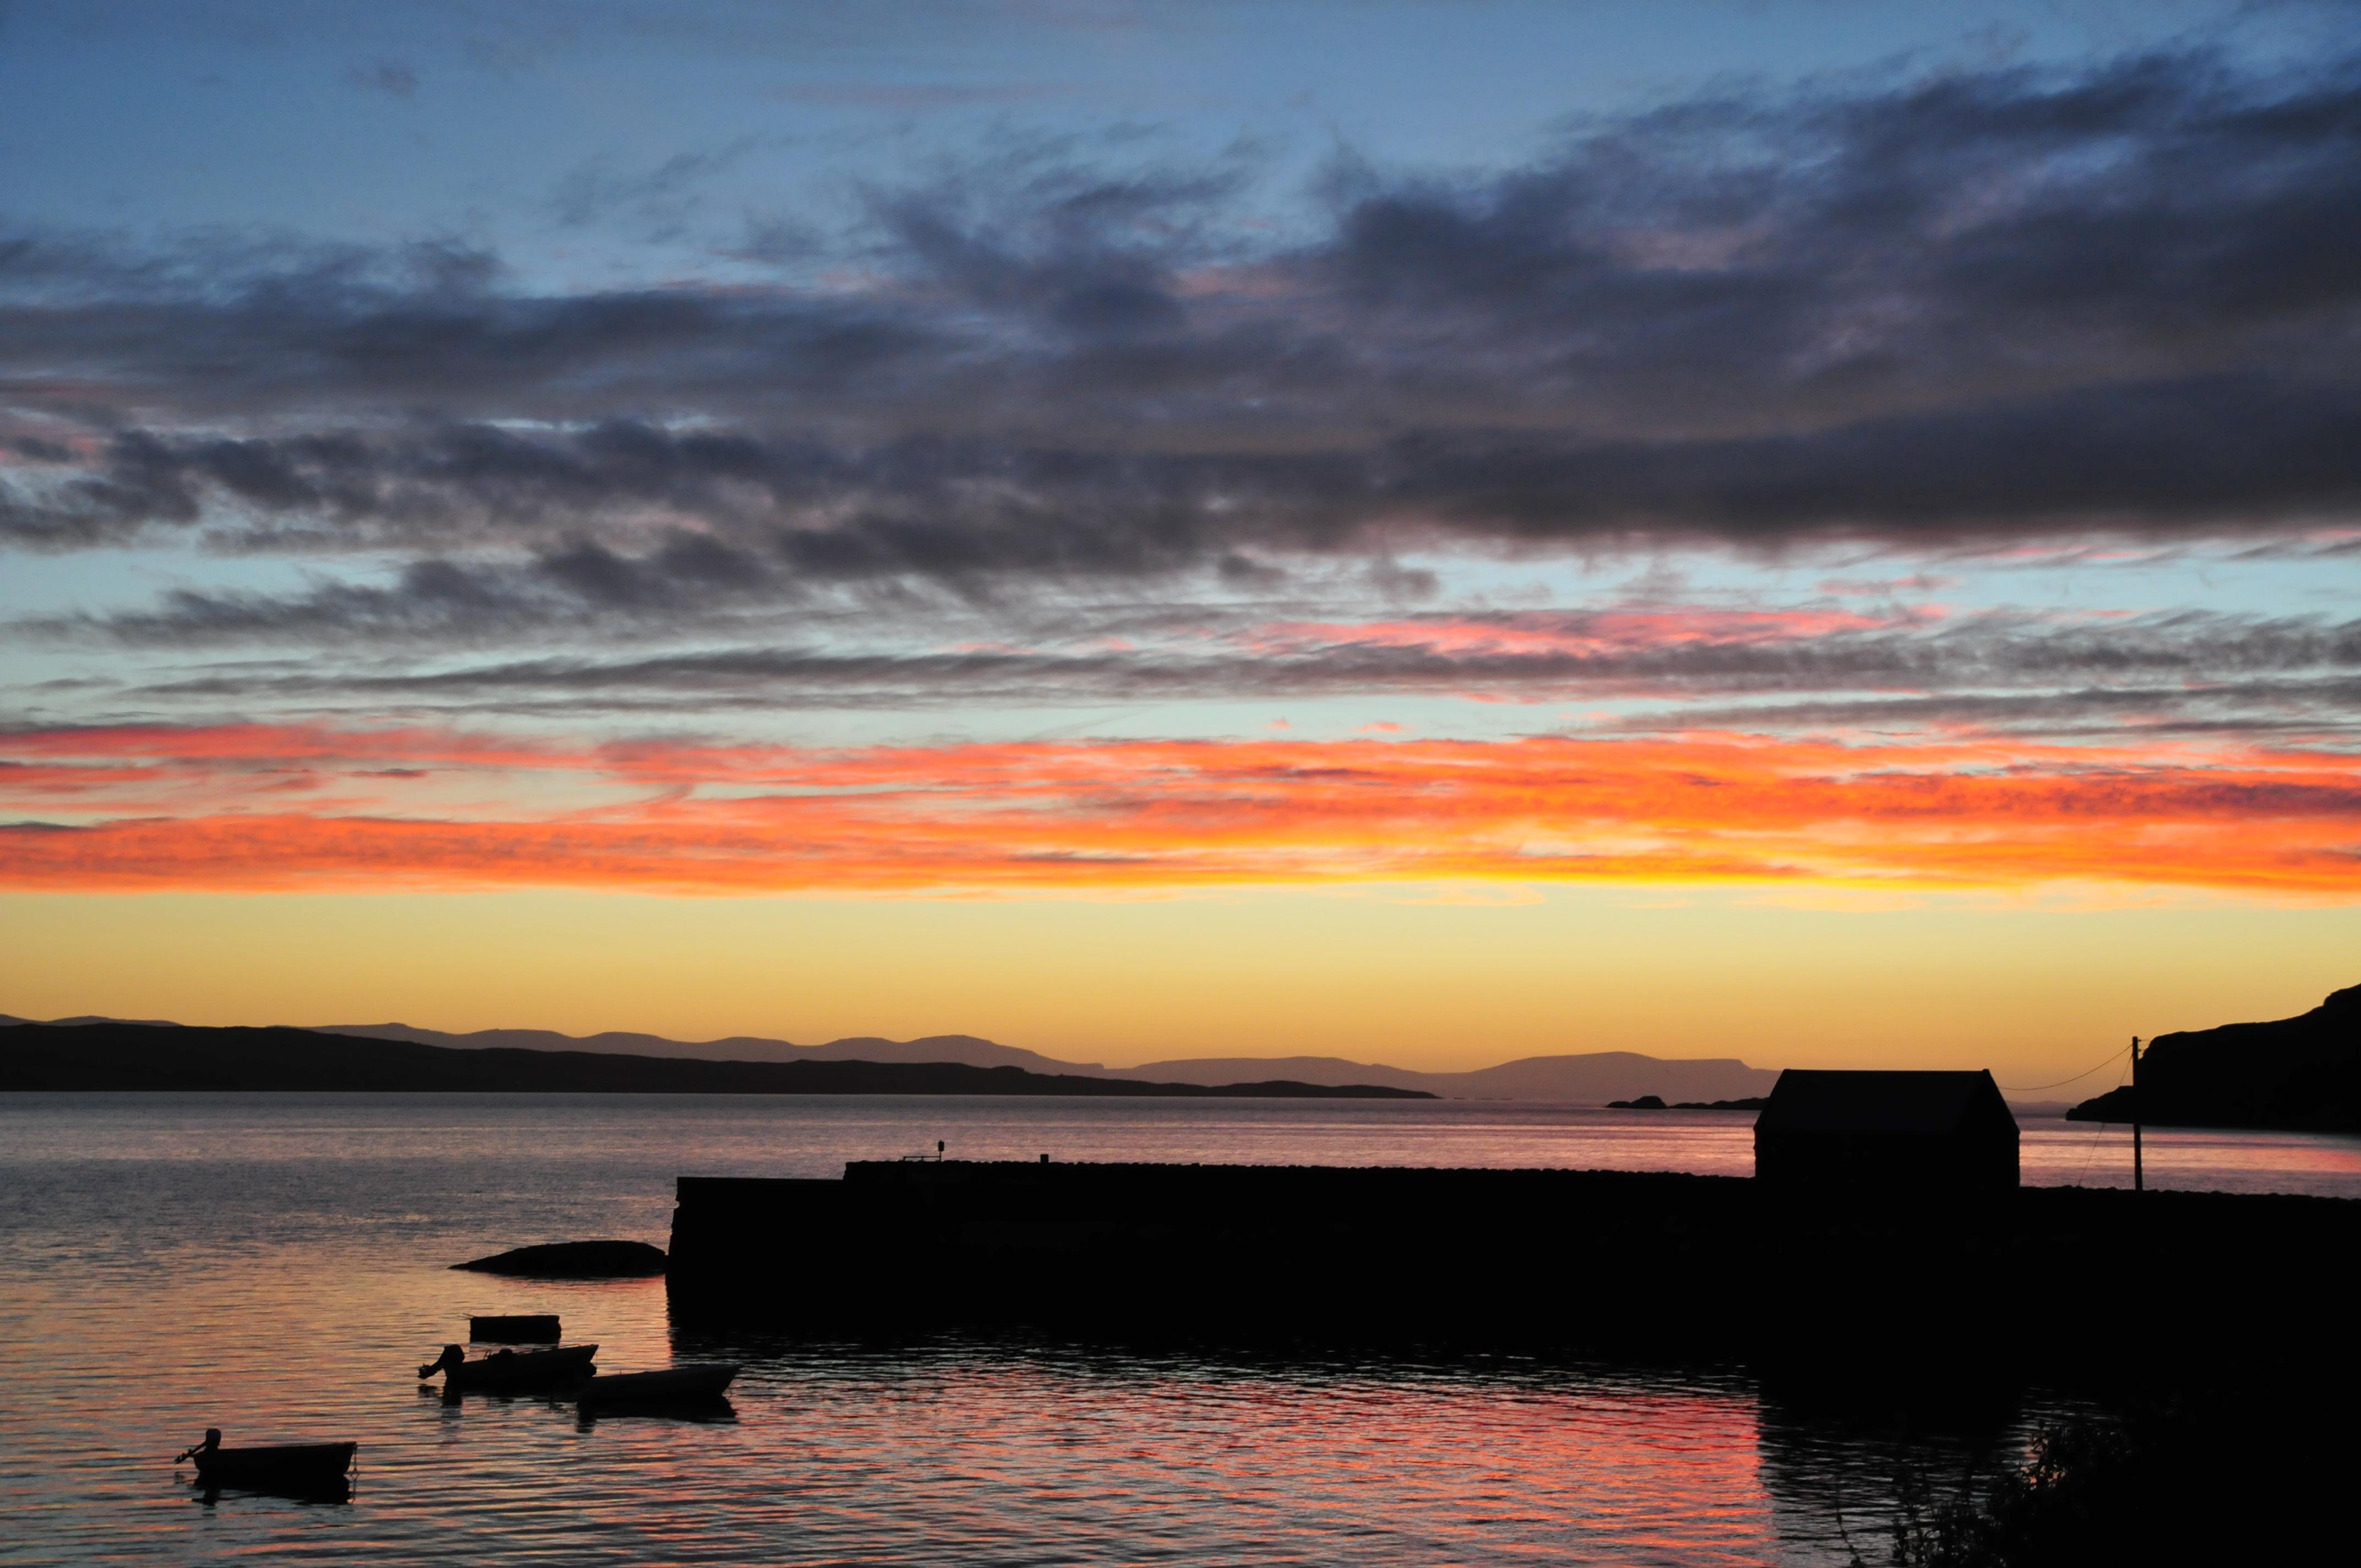 Sunset, Diabaig, Torridon